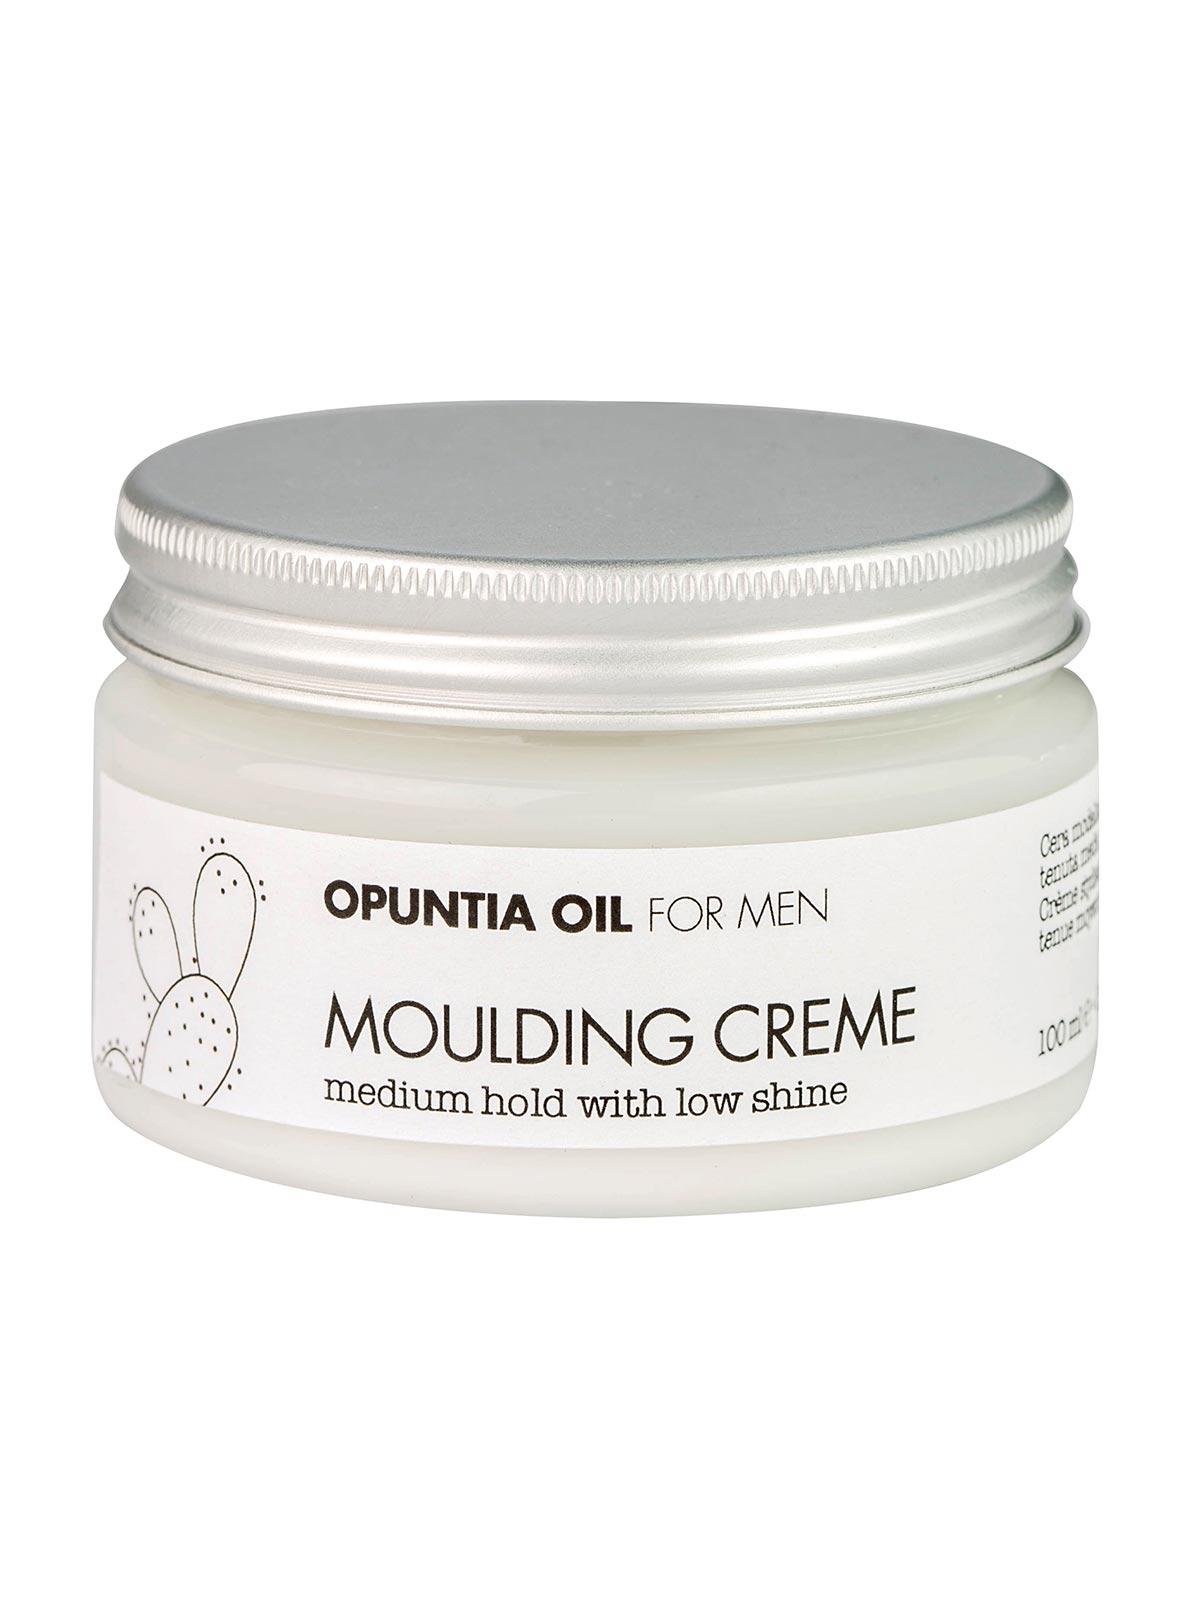 Rica Opuntia Moulding Creme